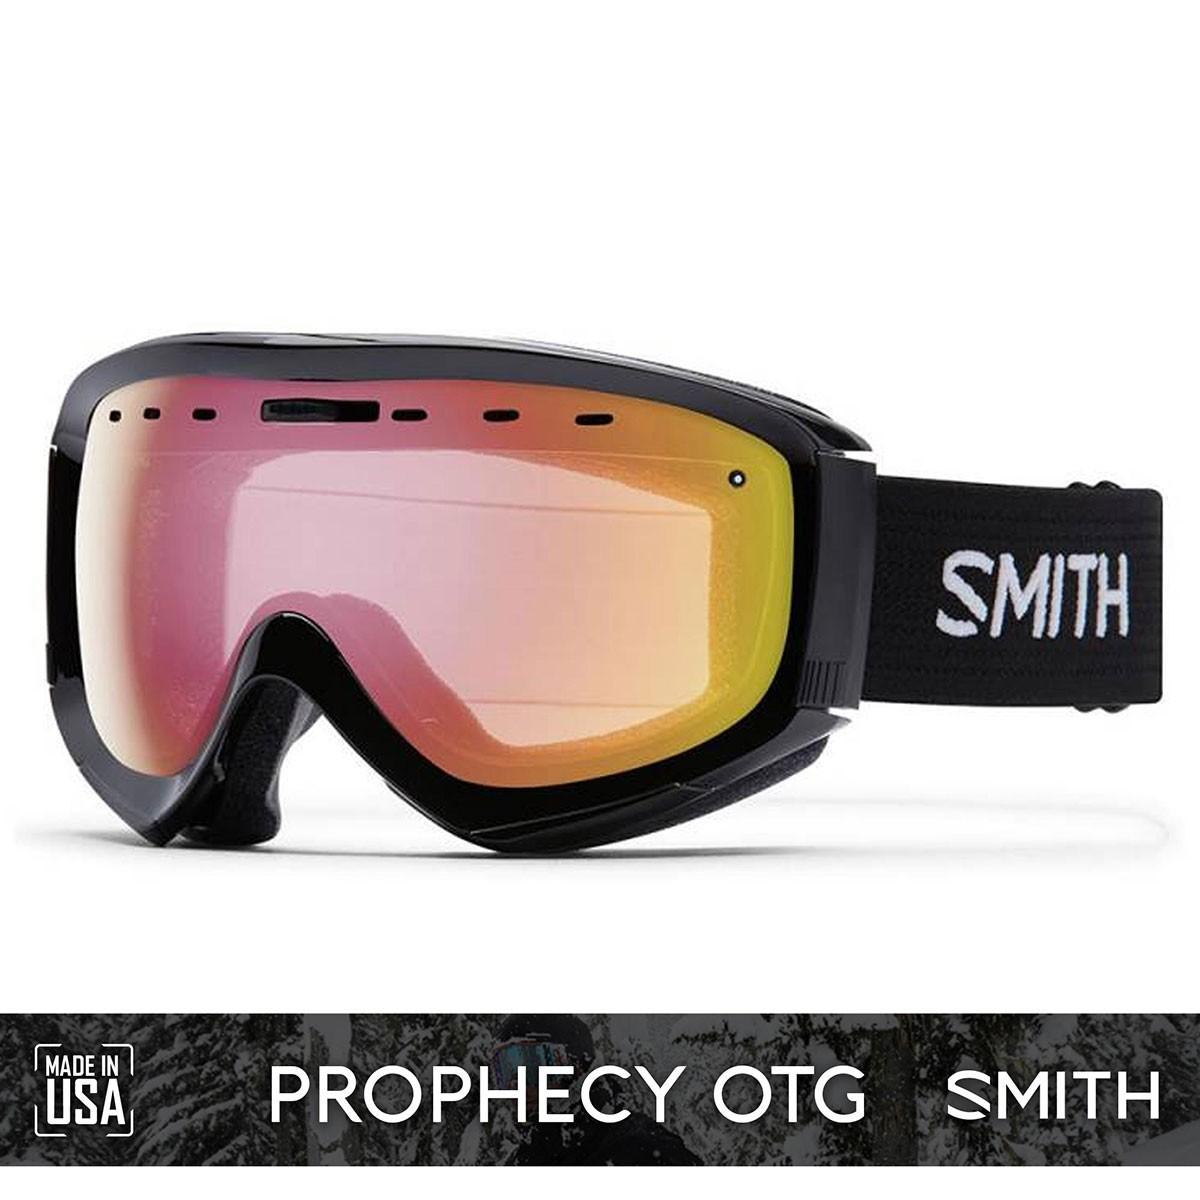 SMITH PROPHECY OTG Black   S2 RED Sensor Mirror - Изображение - AQUAMATRIX